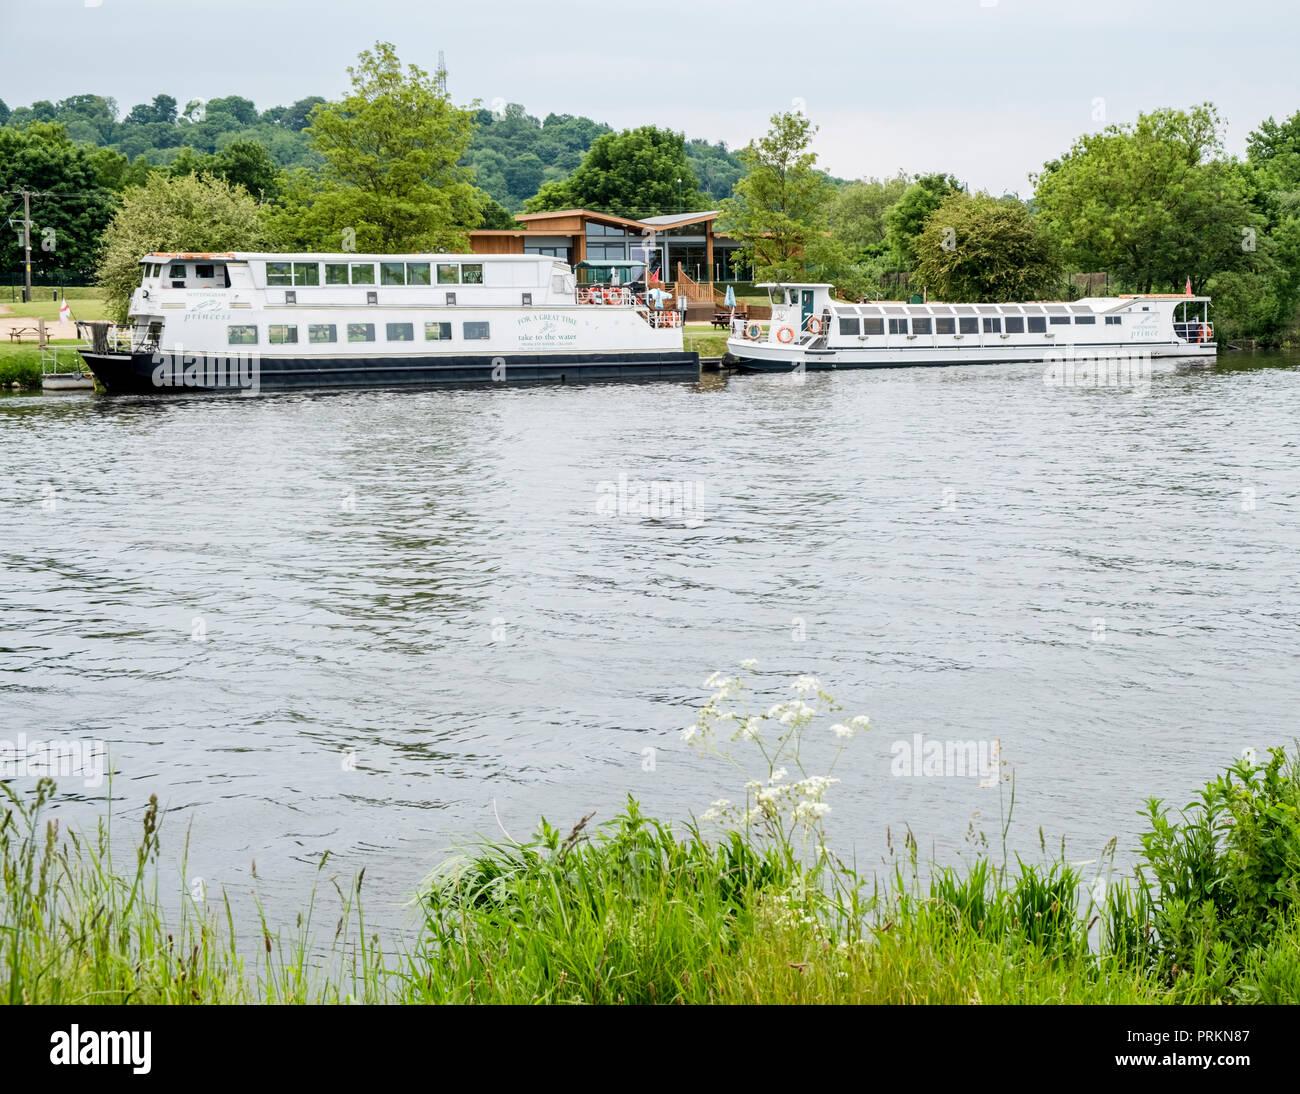 The Nottingham Princess and the Nottingham Prince river boat cruisers, River Trent, Nottingham, England, UK - Stock Image